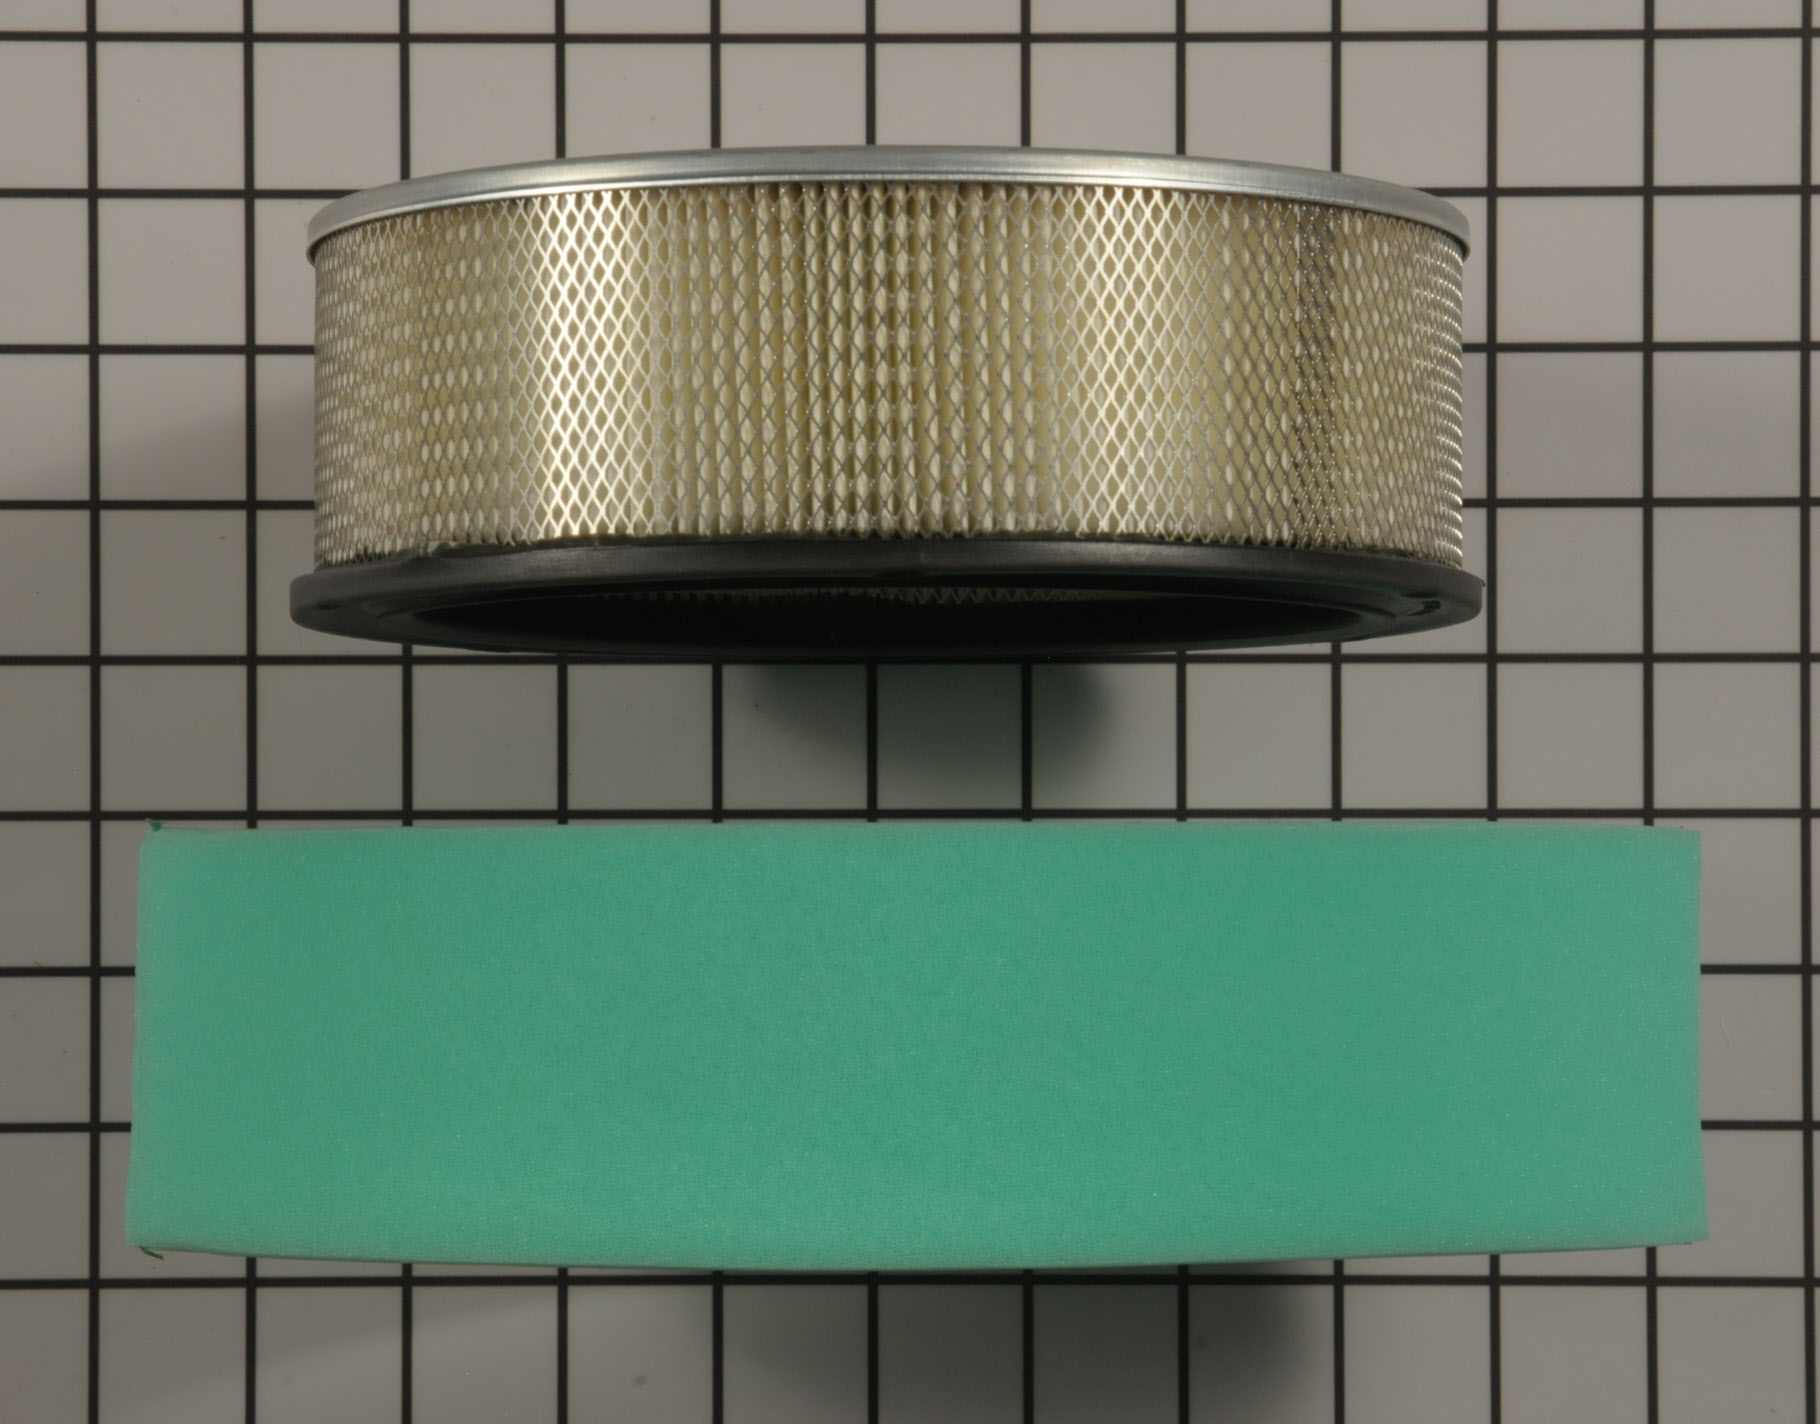 263-32610-A1 Subaru Small Engine Part -Air Filter